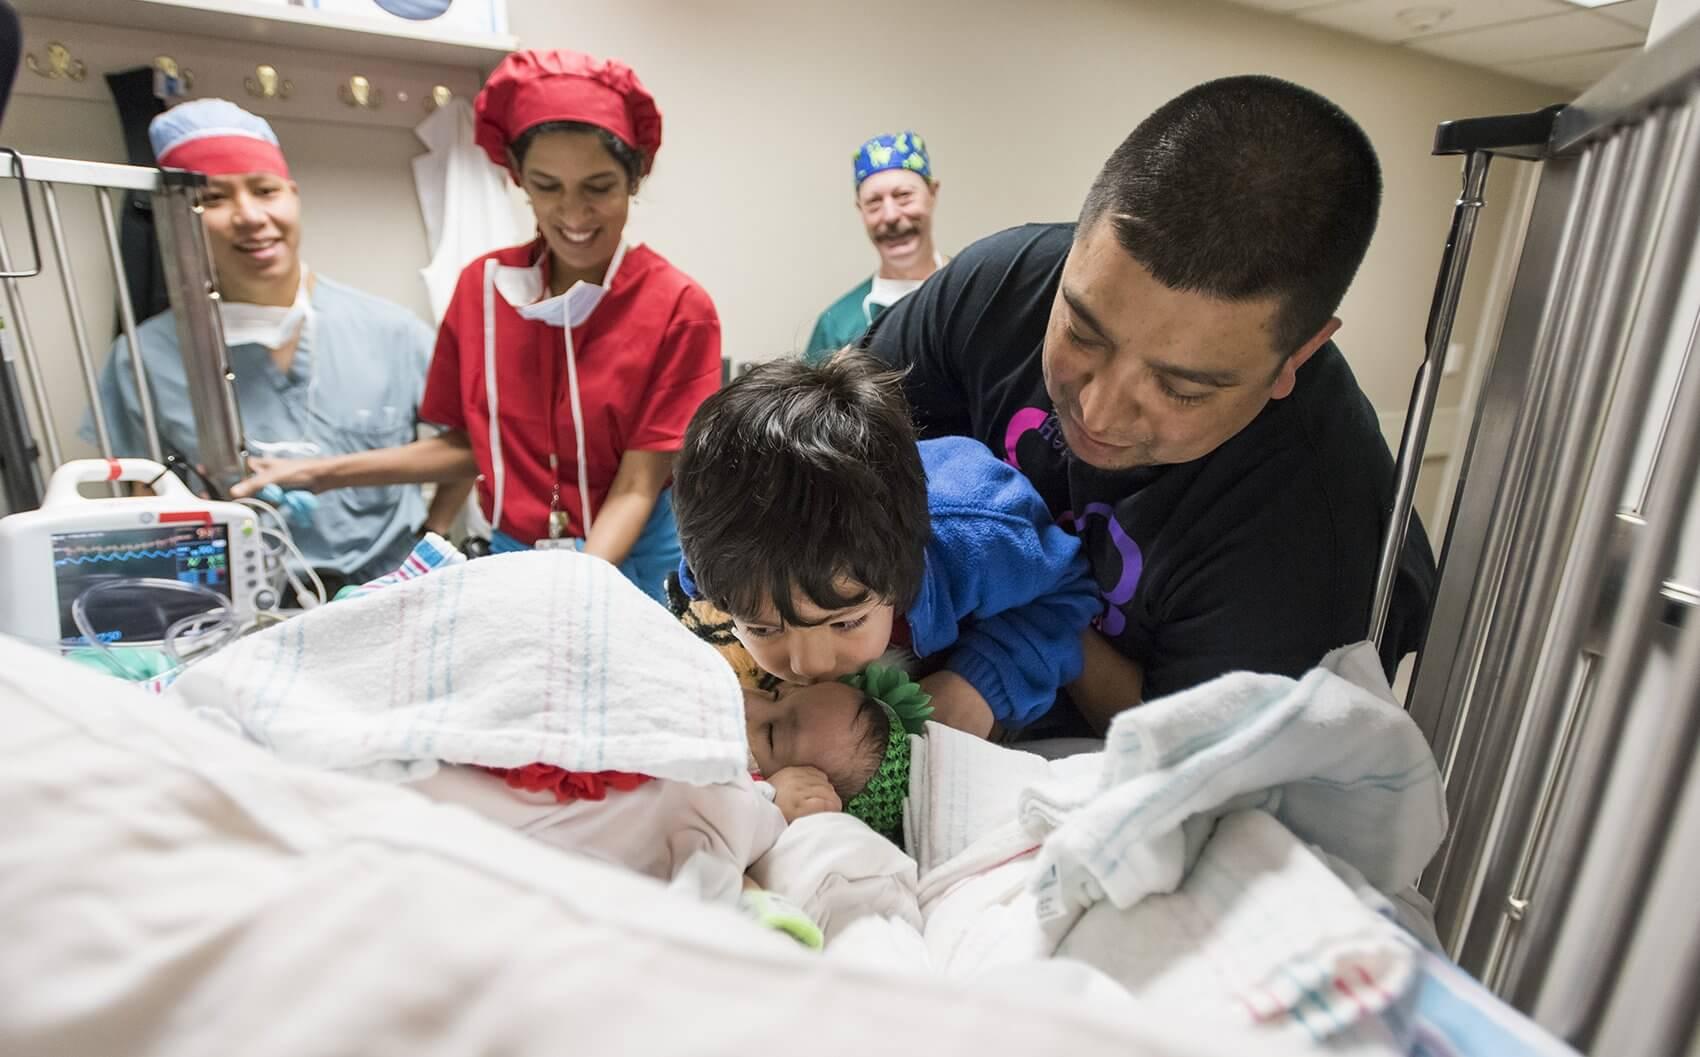 Big brother Azariah kisses his sisters before surgery. (Credit: Allen S. Kramer/Texas Children's Hospital)